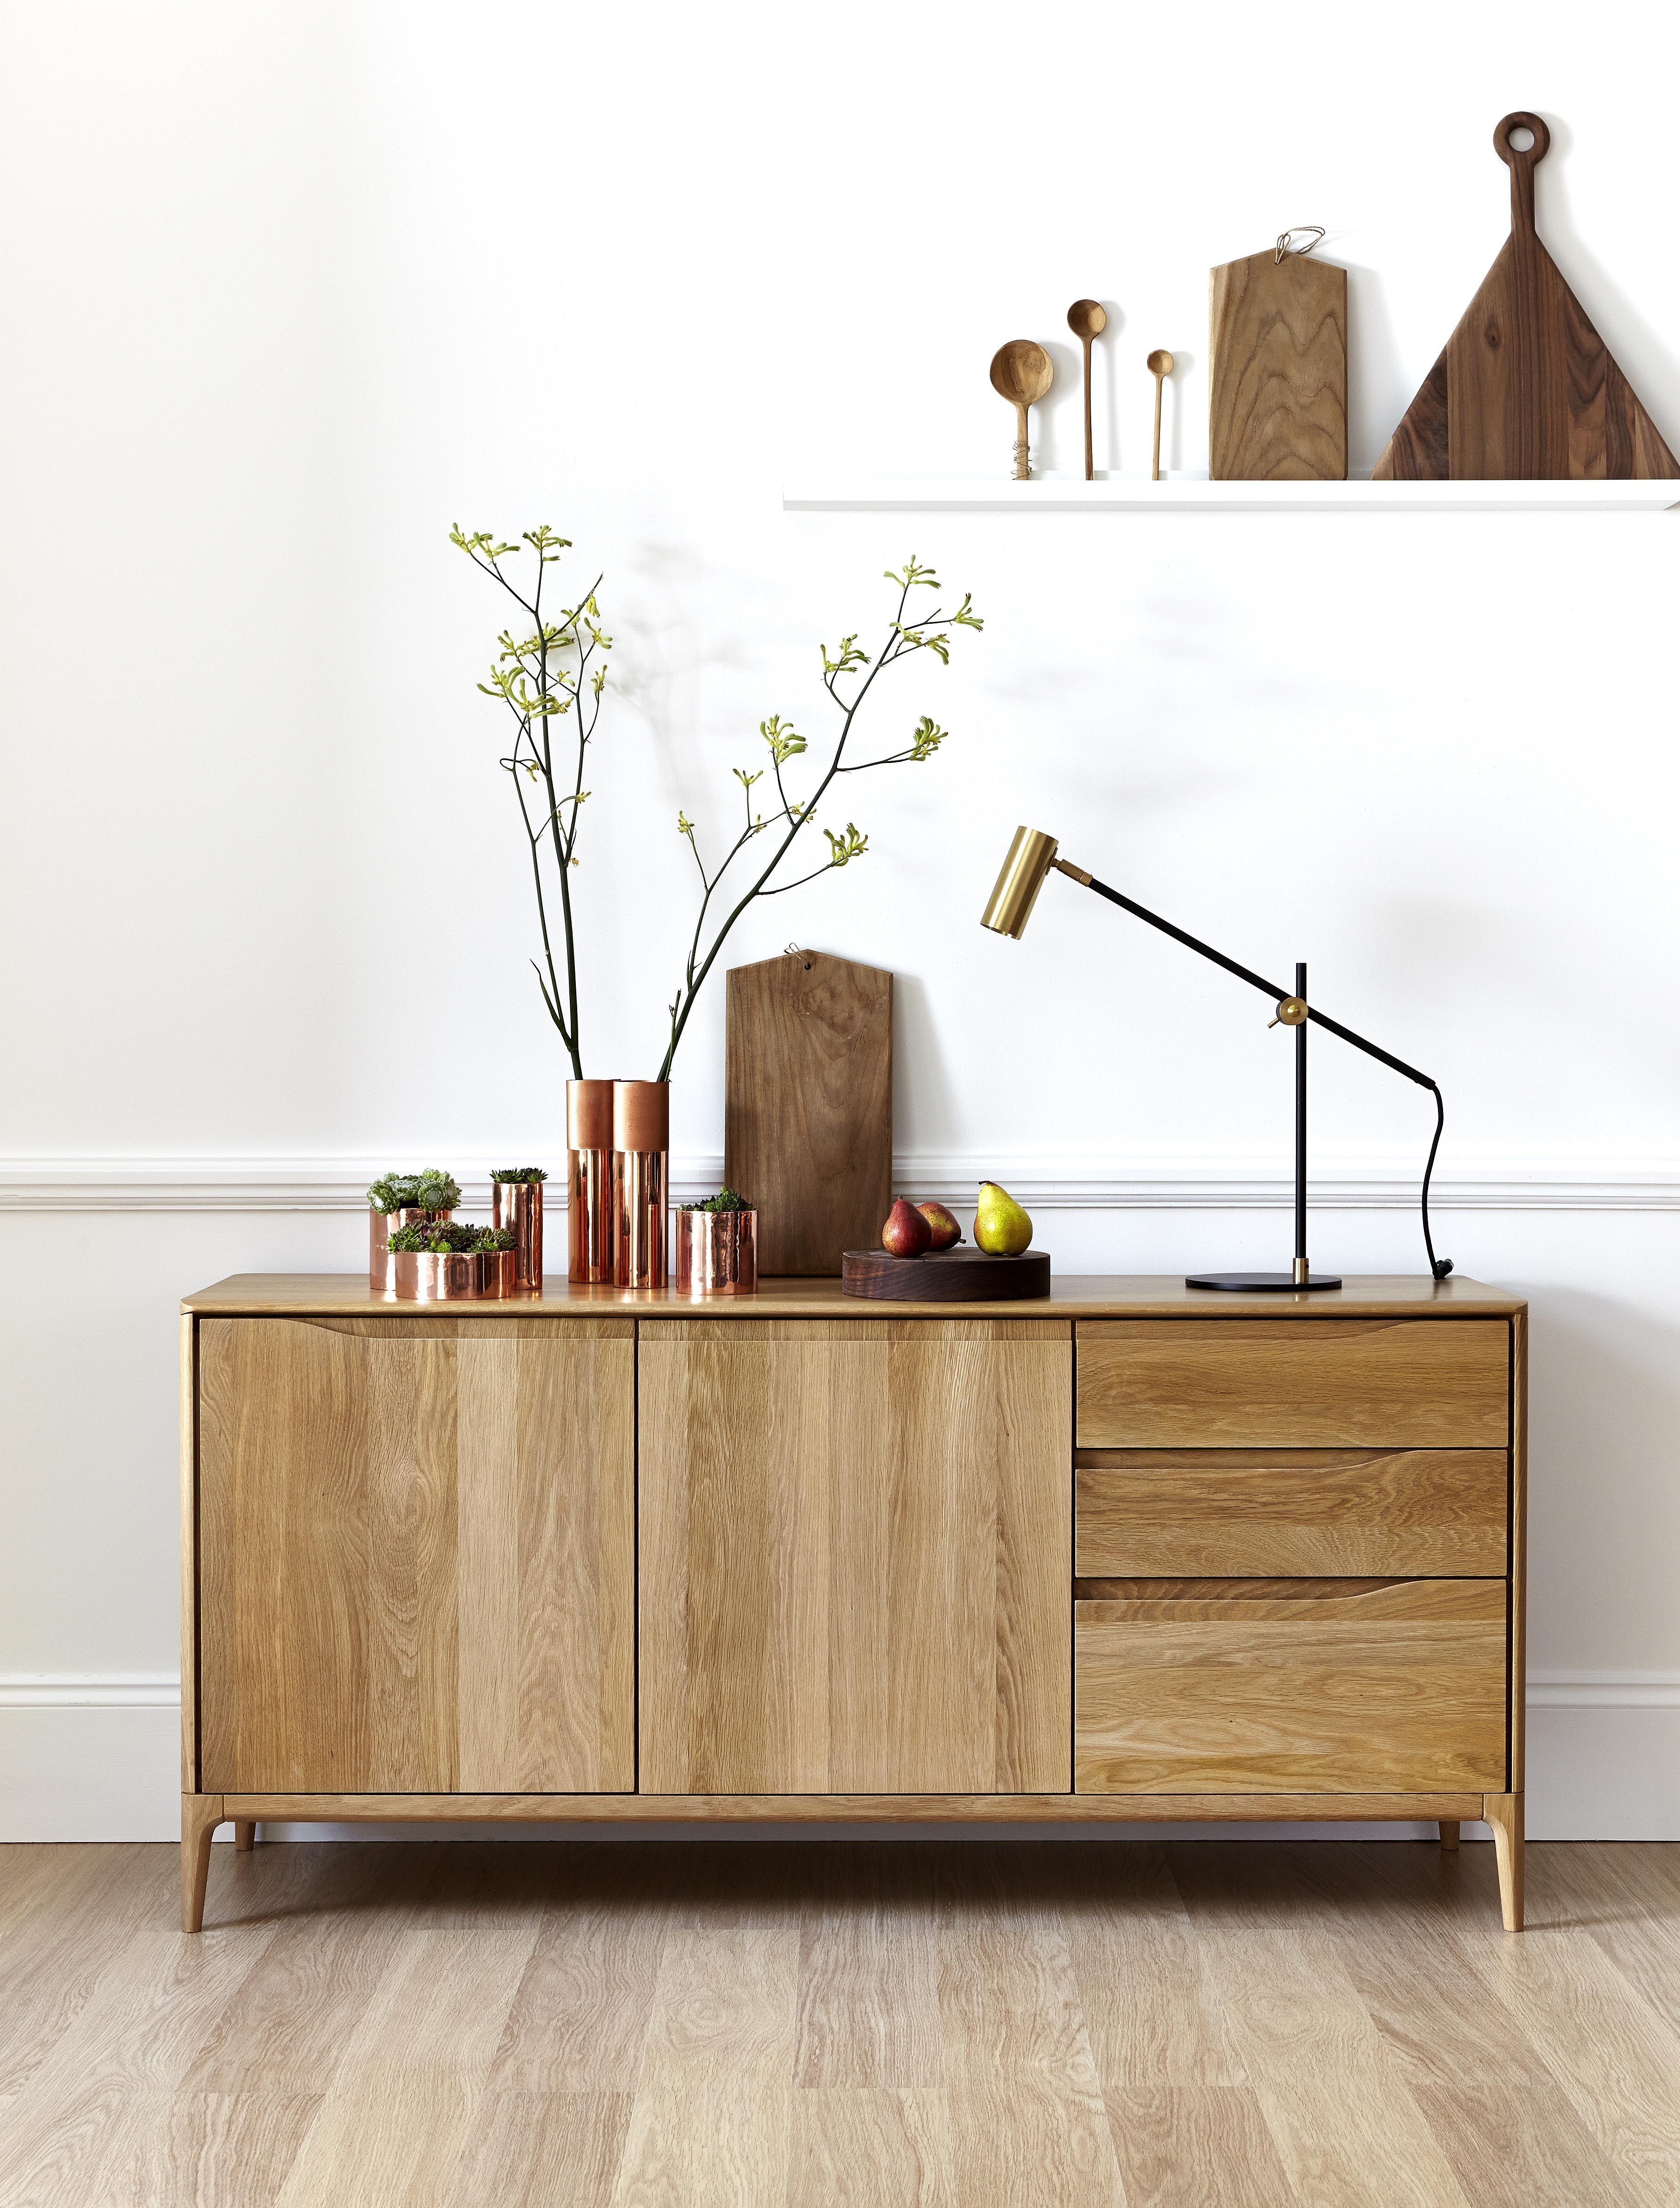 Kommode design modern  Ercol Romana Sideboard - simplel, mid century modern style ...